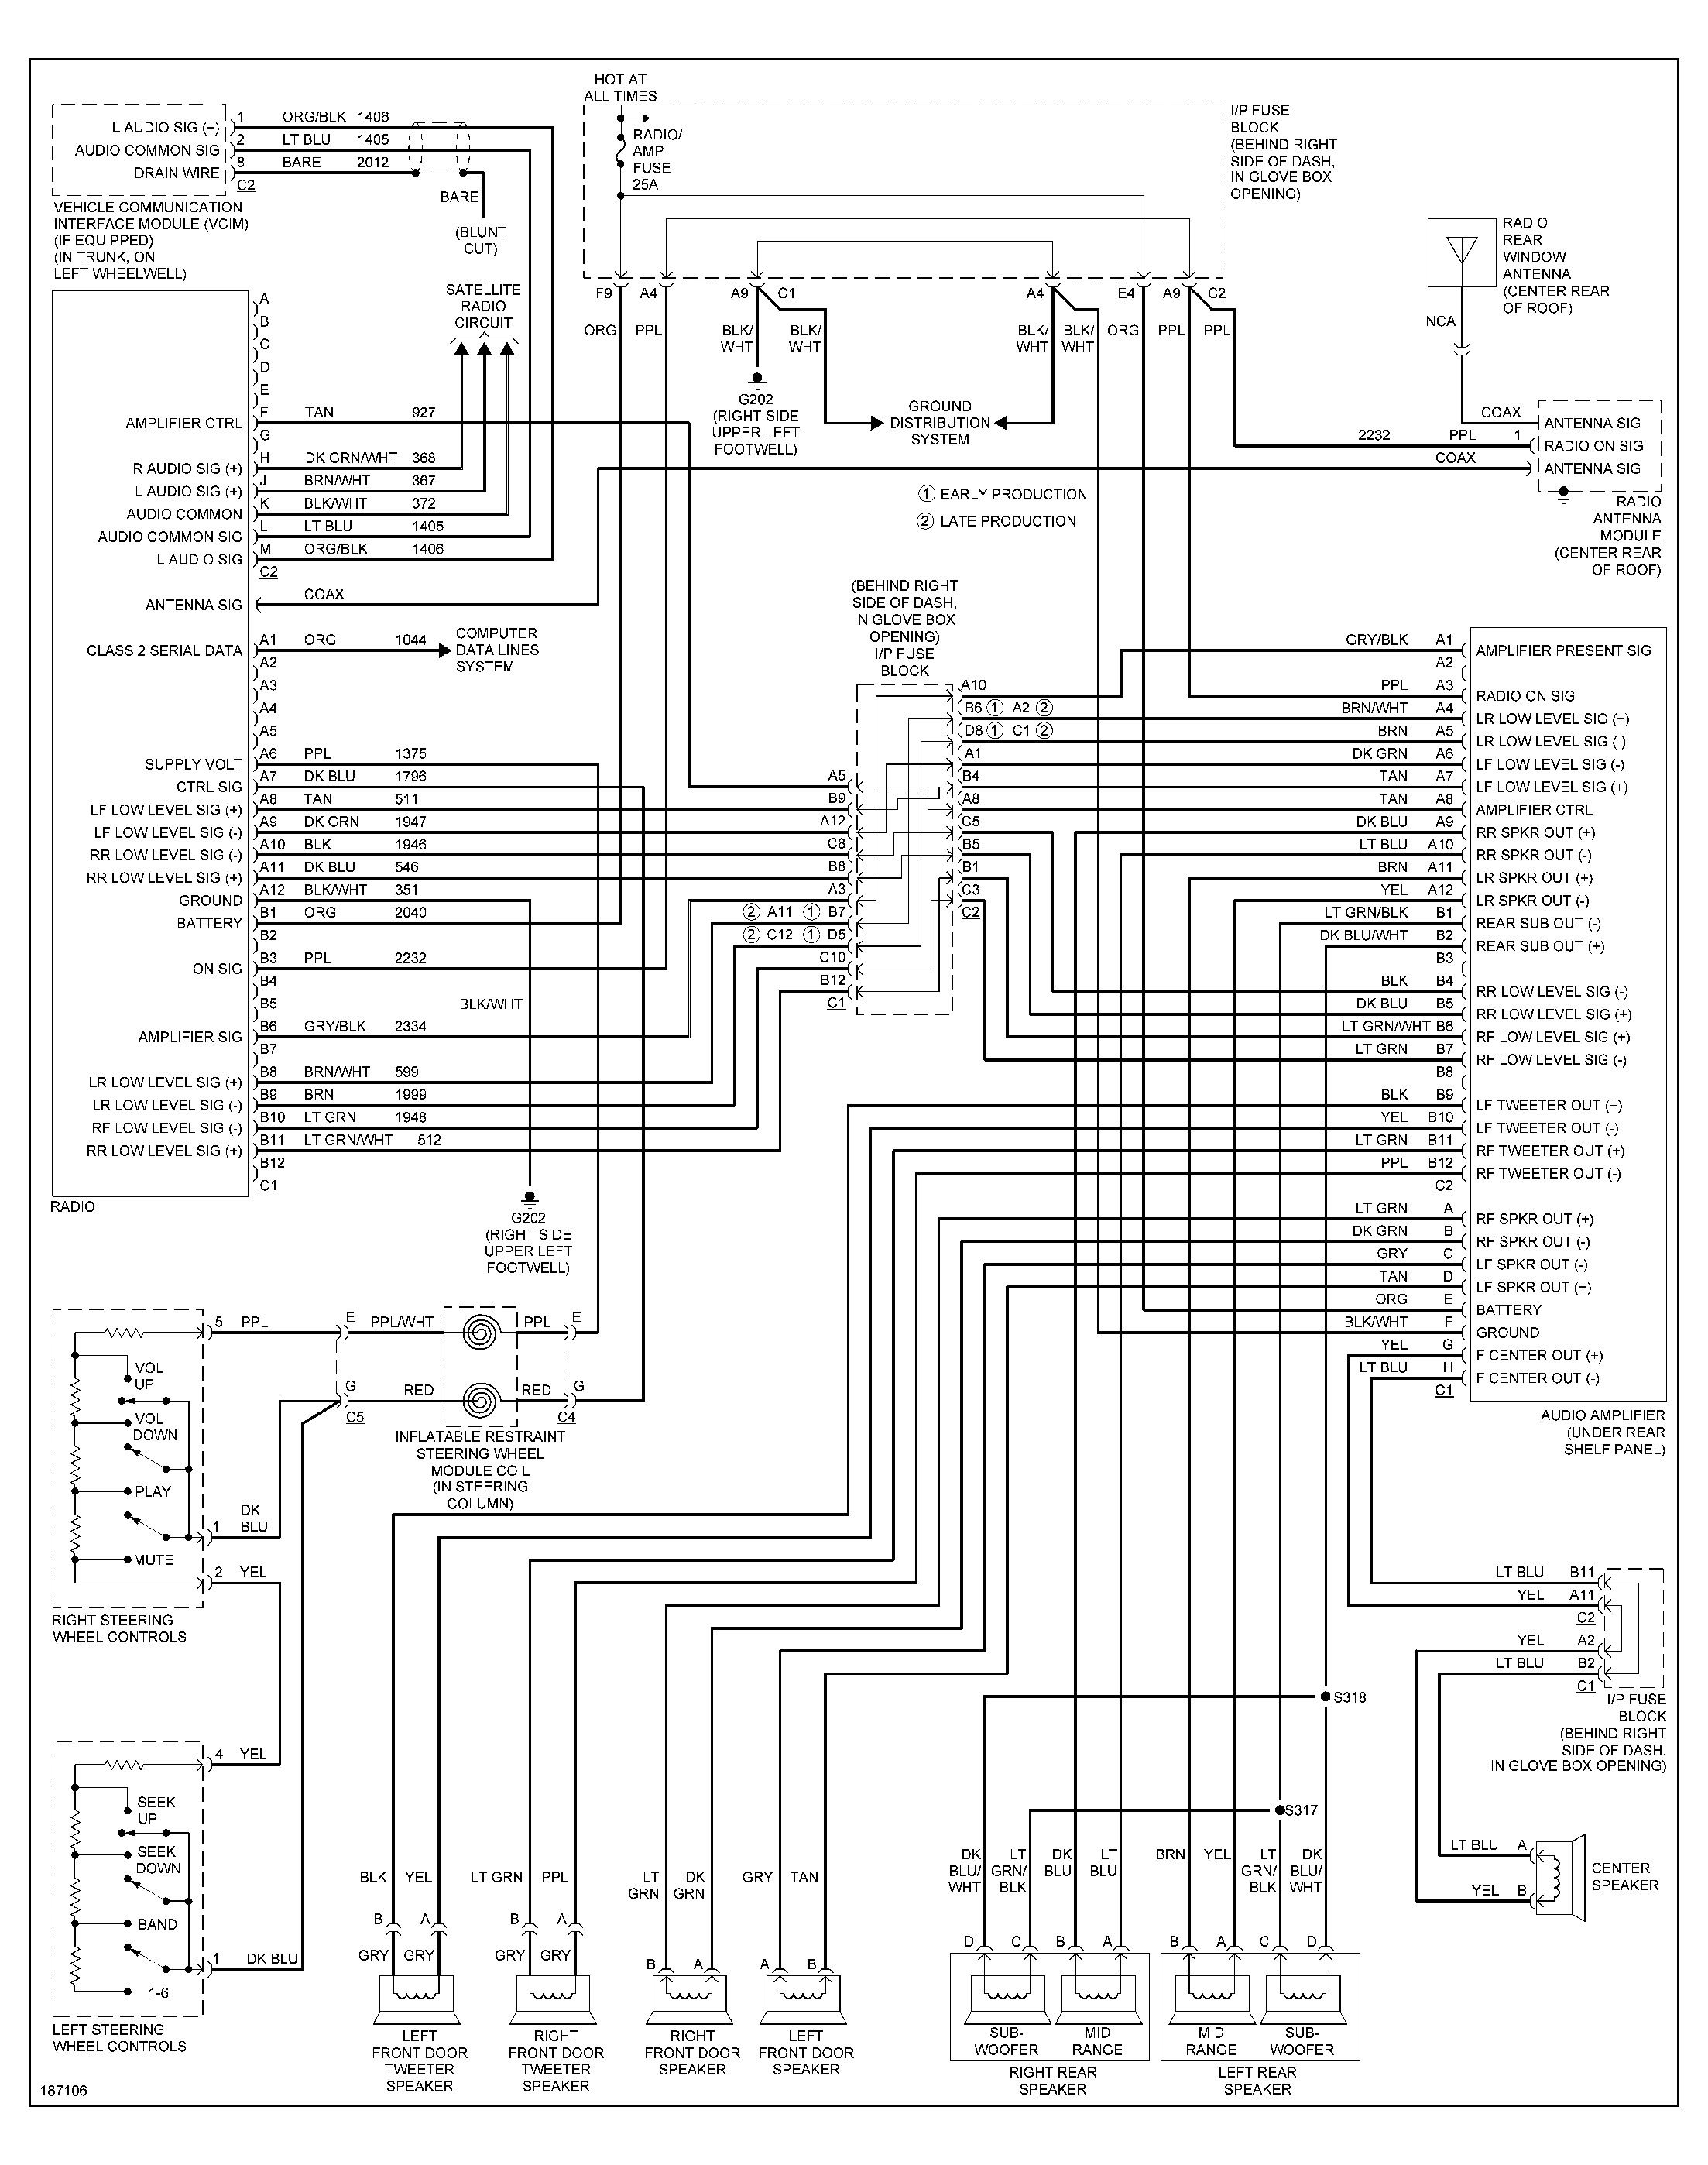 2000 Pontiac Grand Prix Radio Wiring Diagram